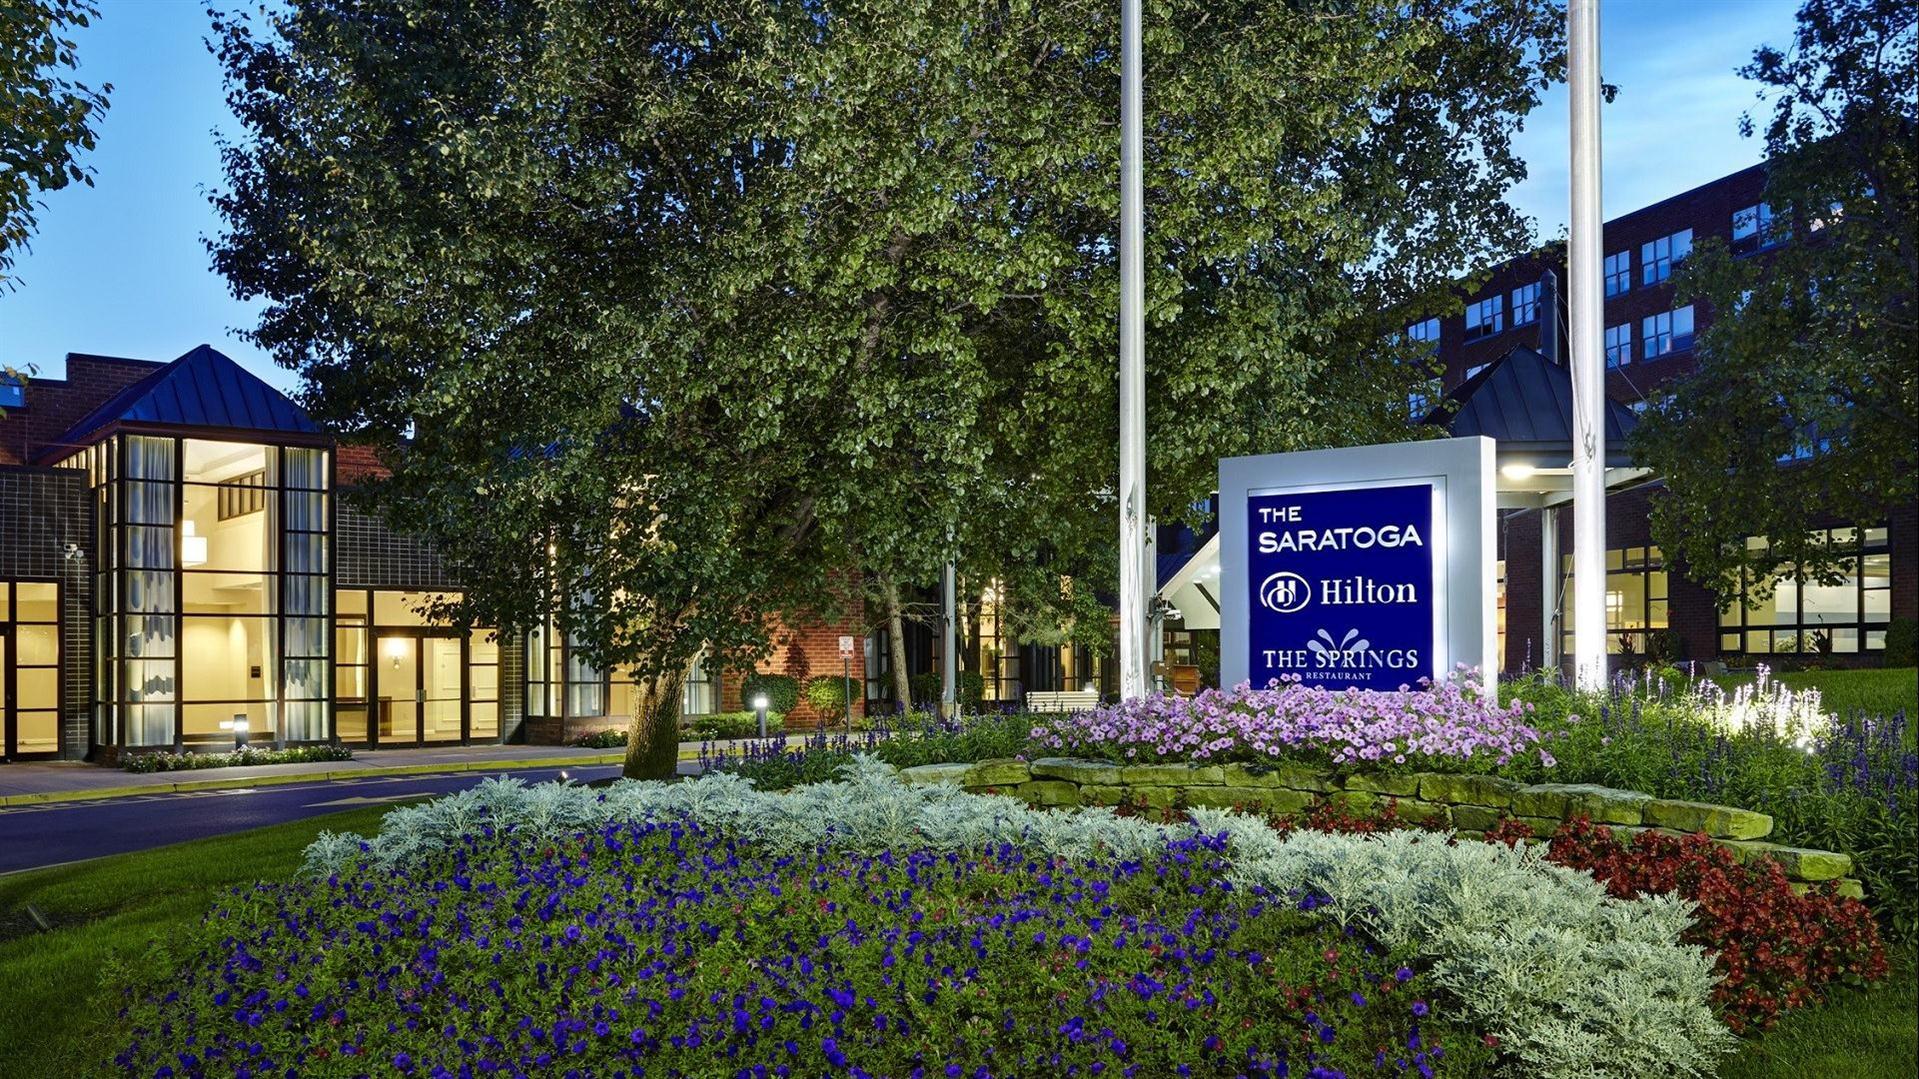 Meetings And Events At The Saratoga Hilton Saratoga Springs Ny Us